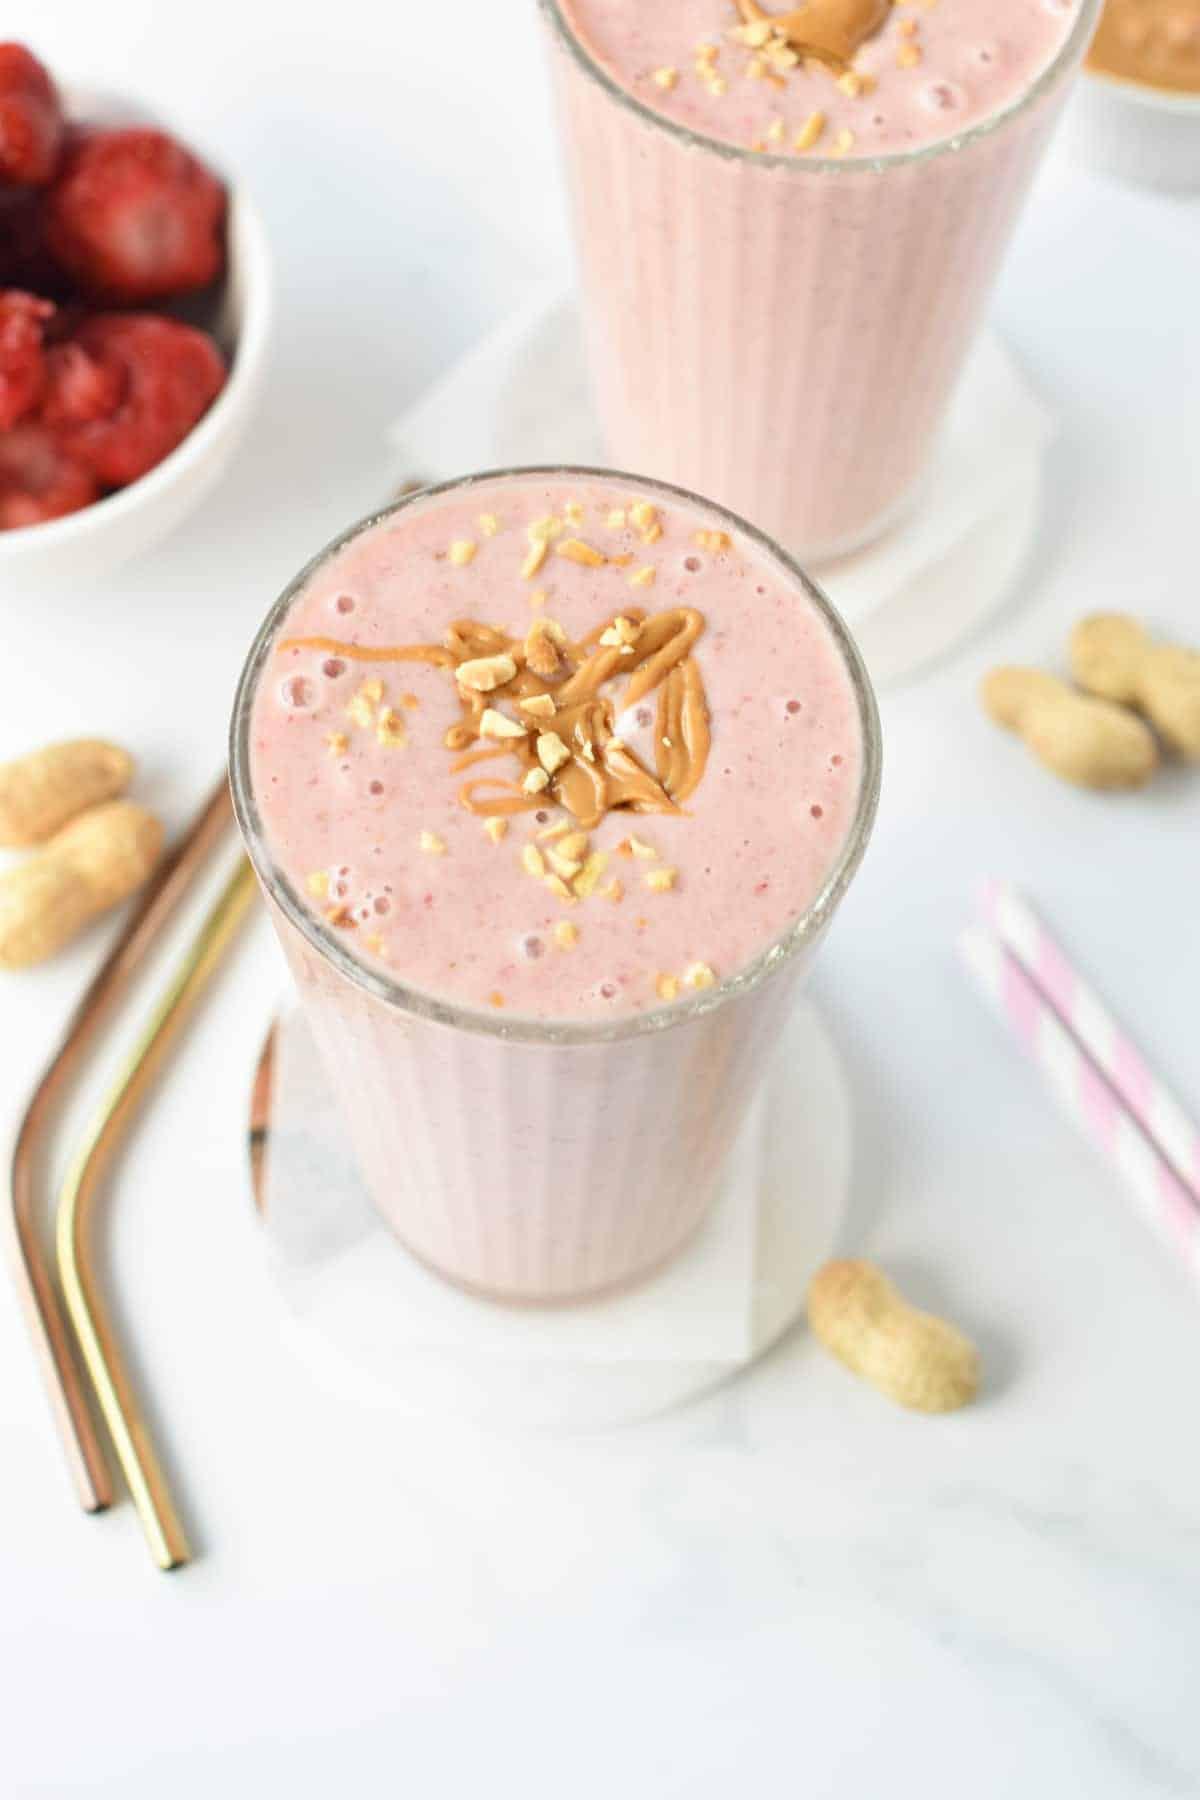 4-ingredients Strawberry Smoothie